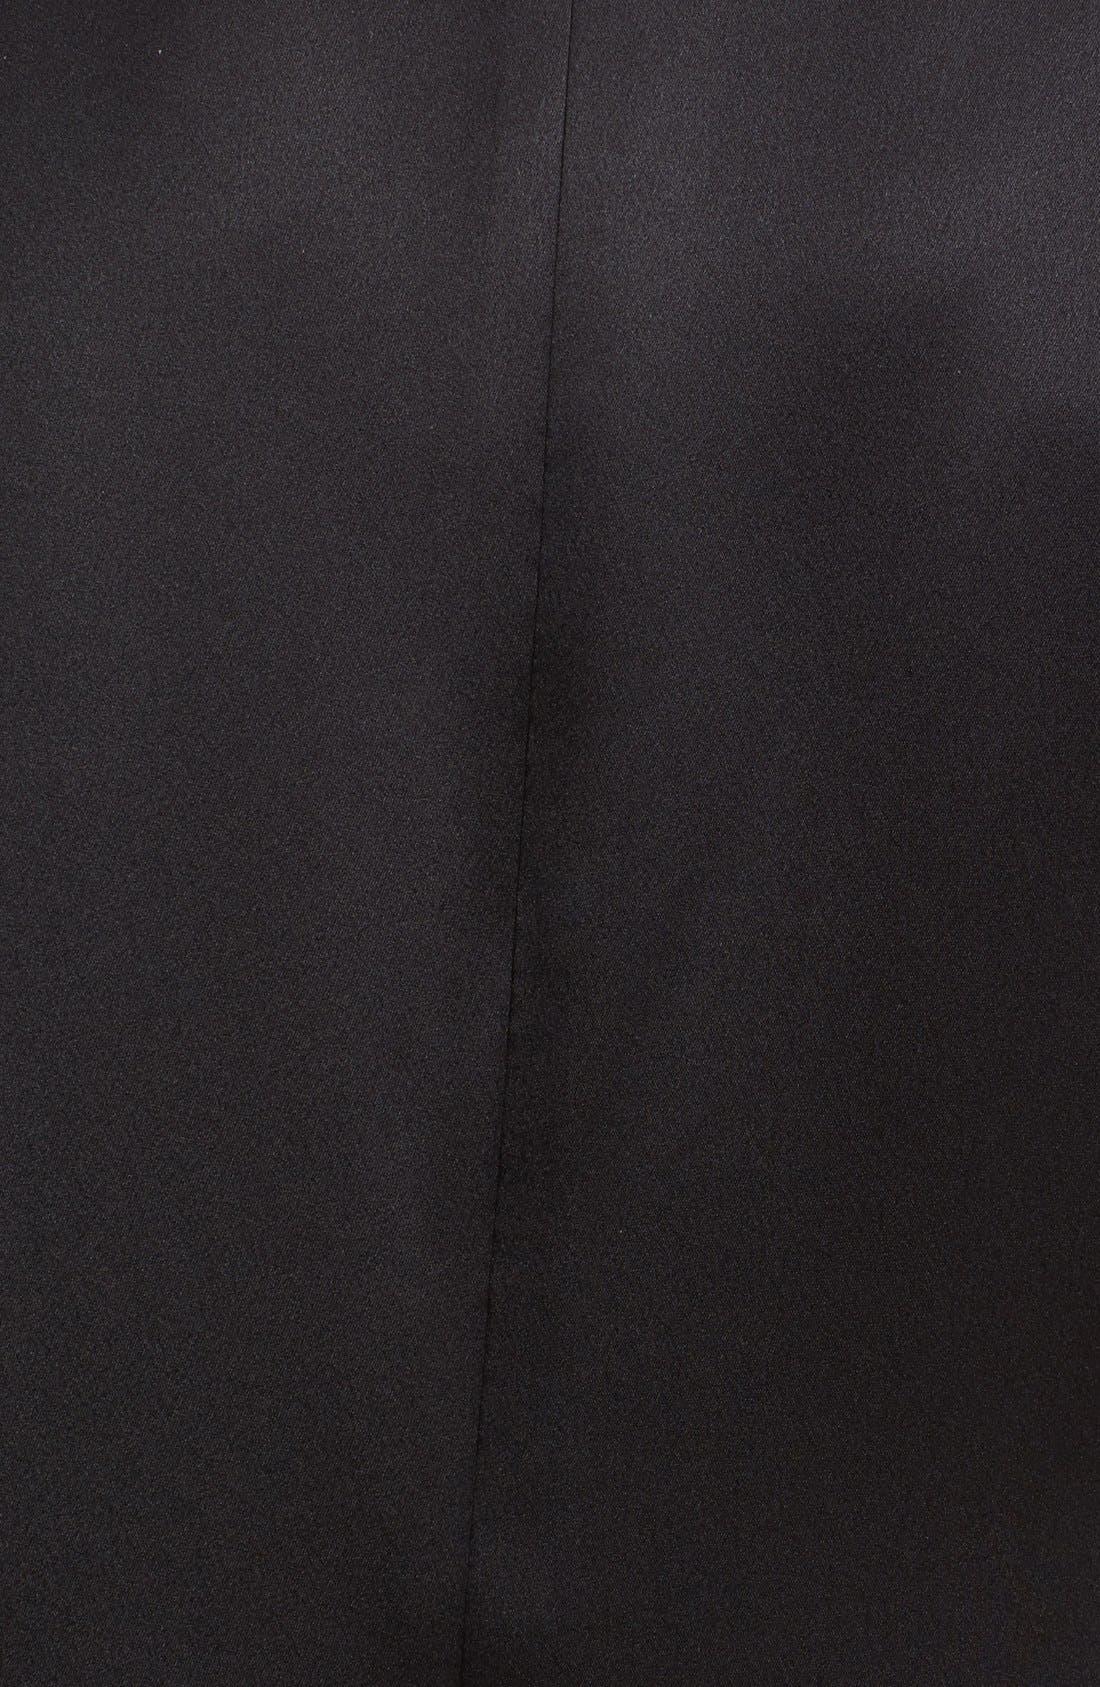 Short Sleeve Crepe Back Top,                             Alternate thumbnail 3, color,                             001